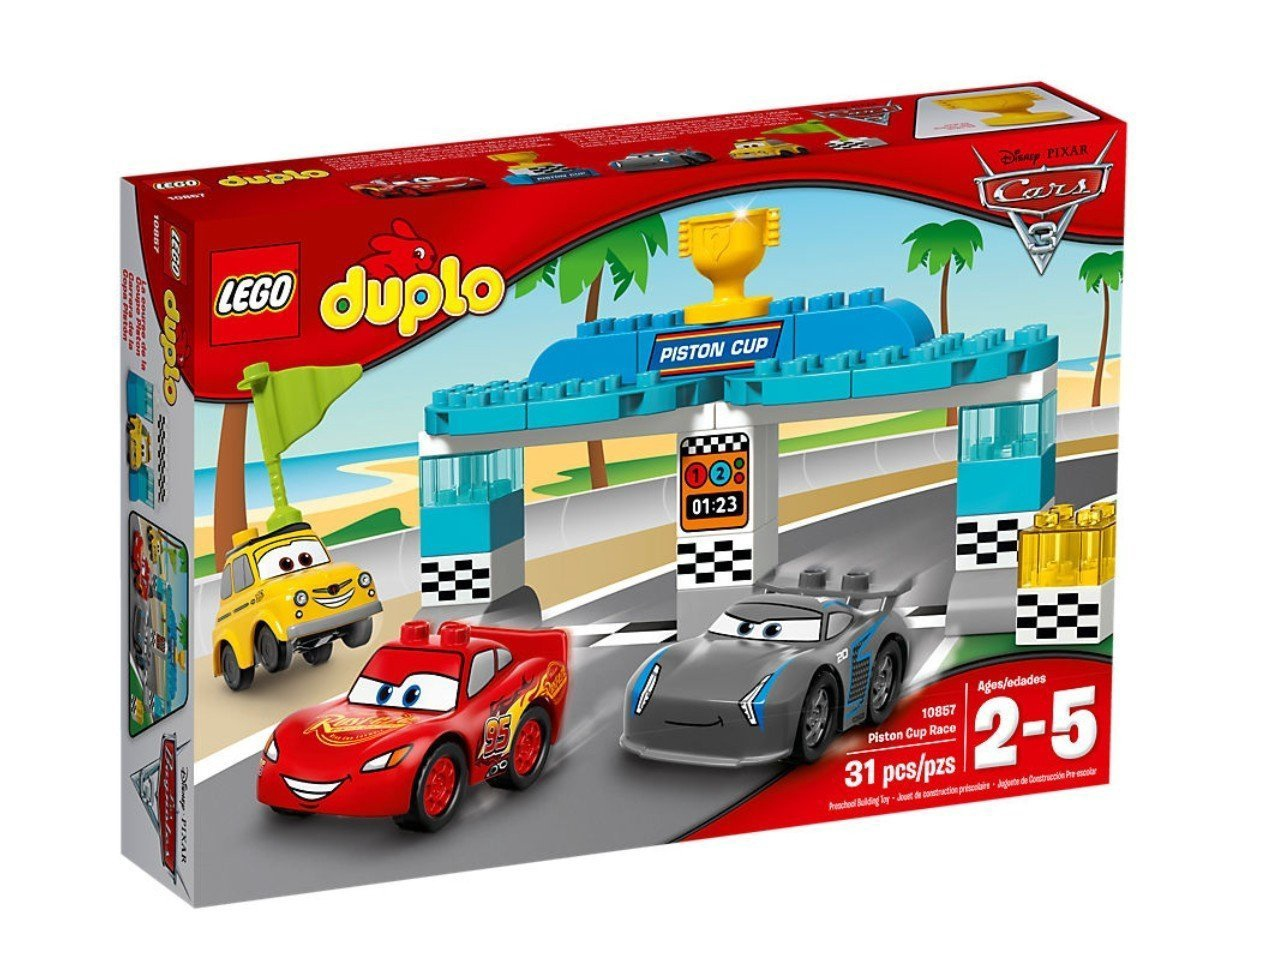 LEGO DUPLO DISNEY CARS 3 PISTON CUP RACE